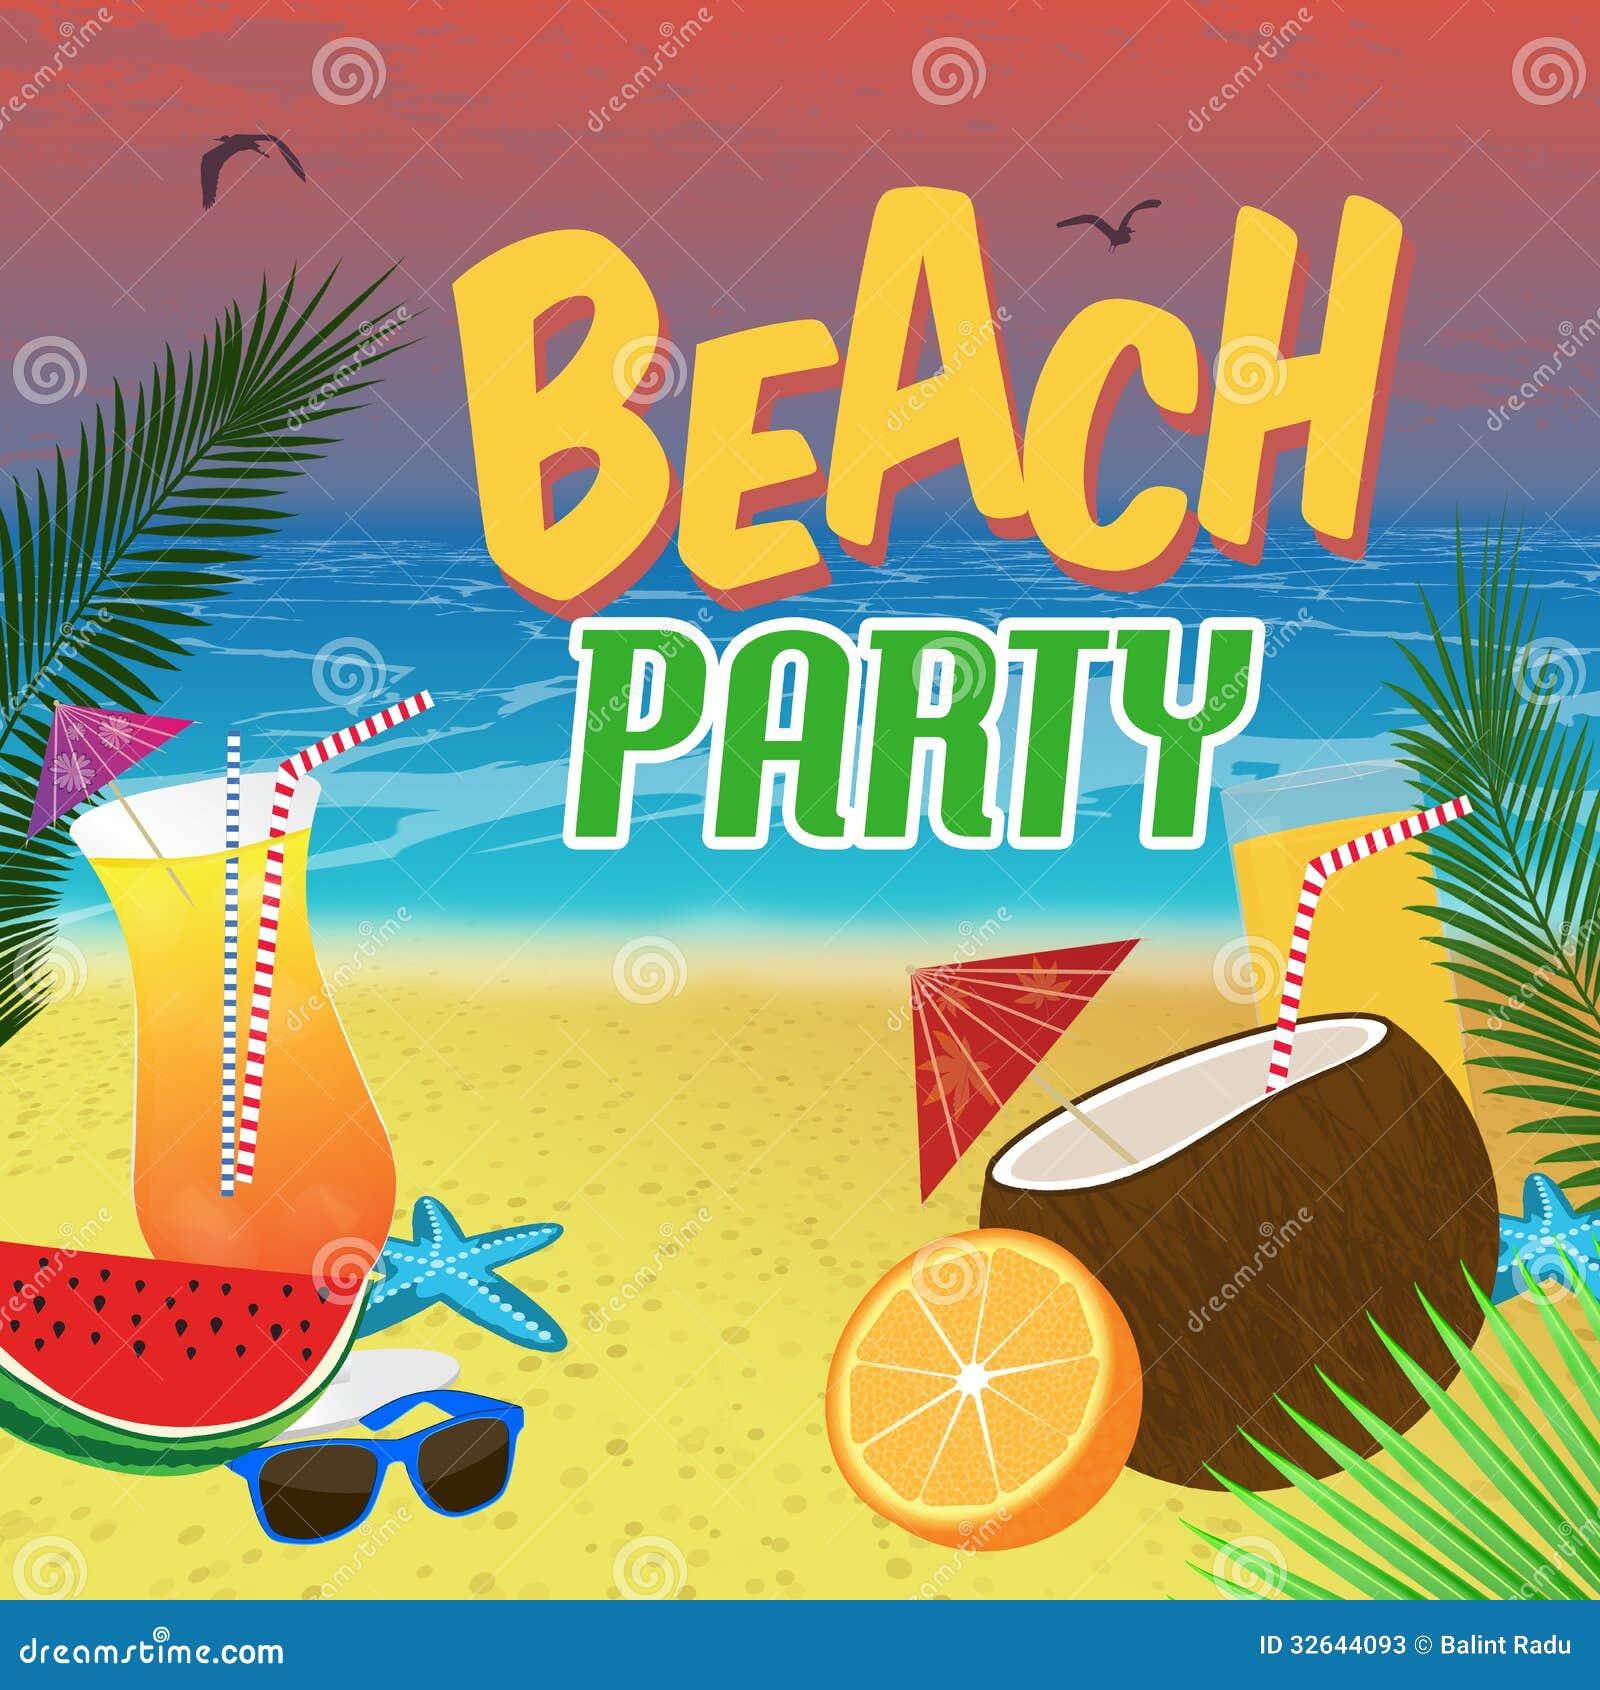 Beach Party Poster Stock Photos Image 32644093